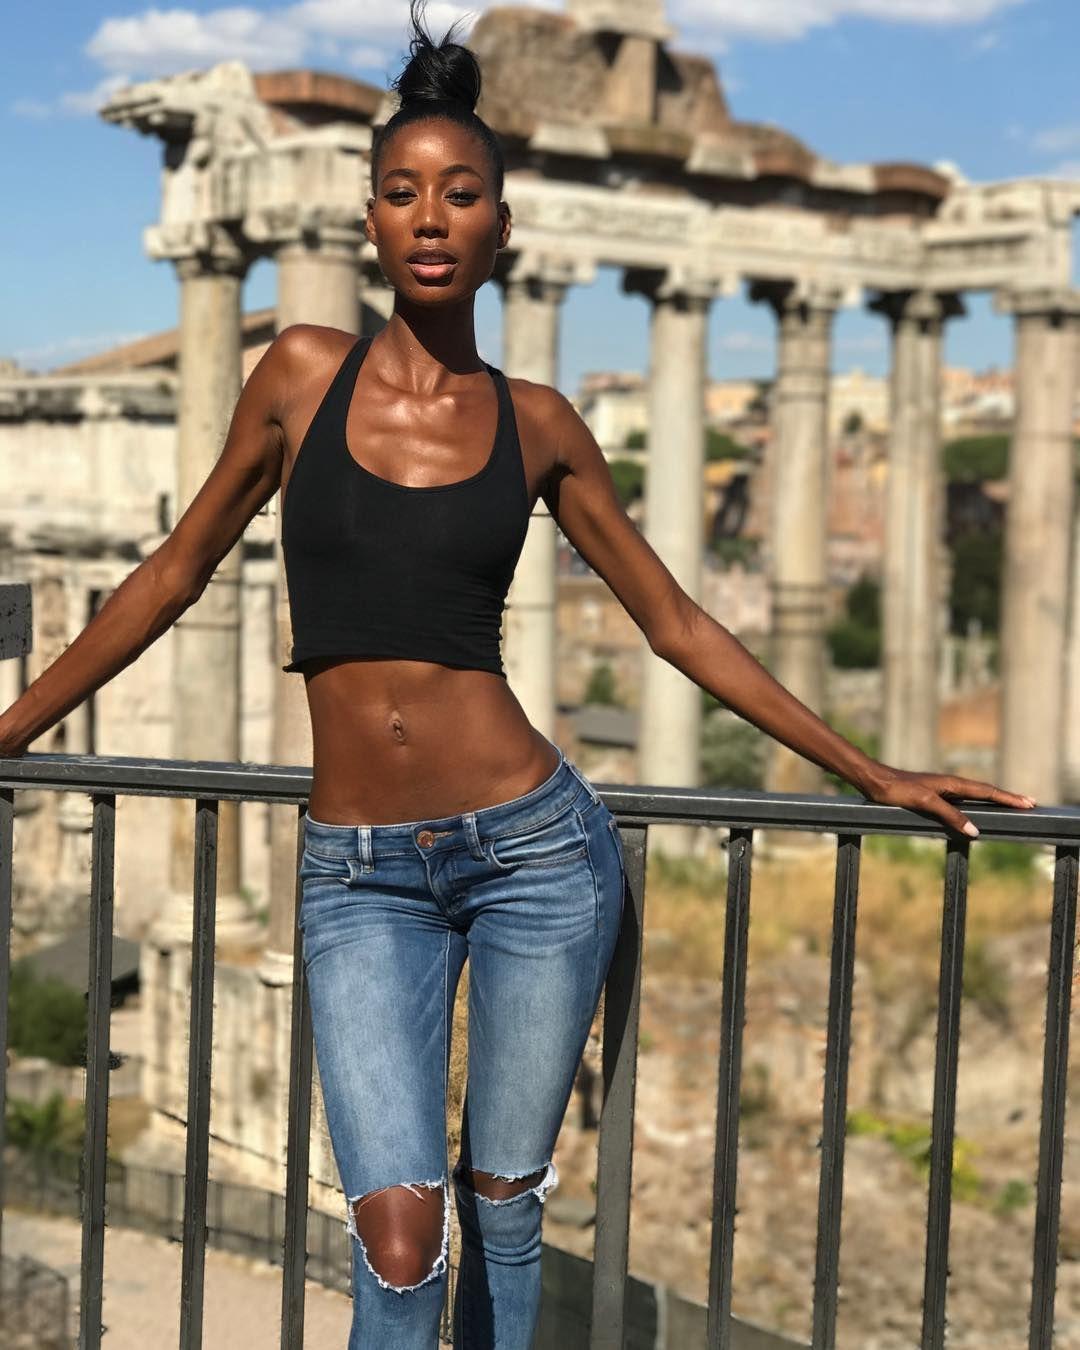 Skinniest girls — 1